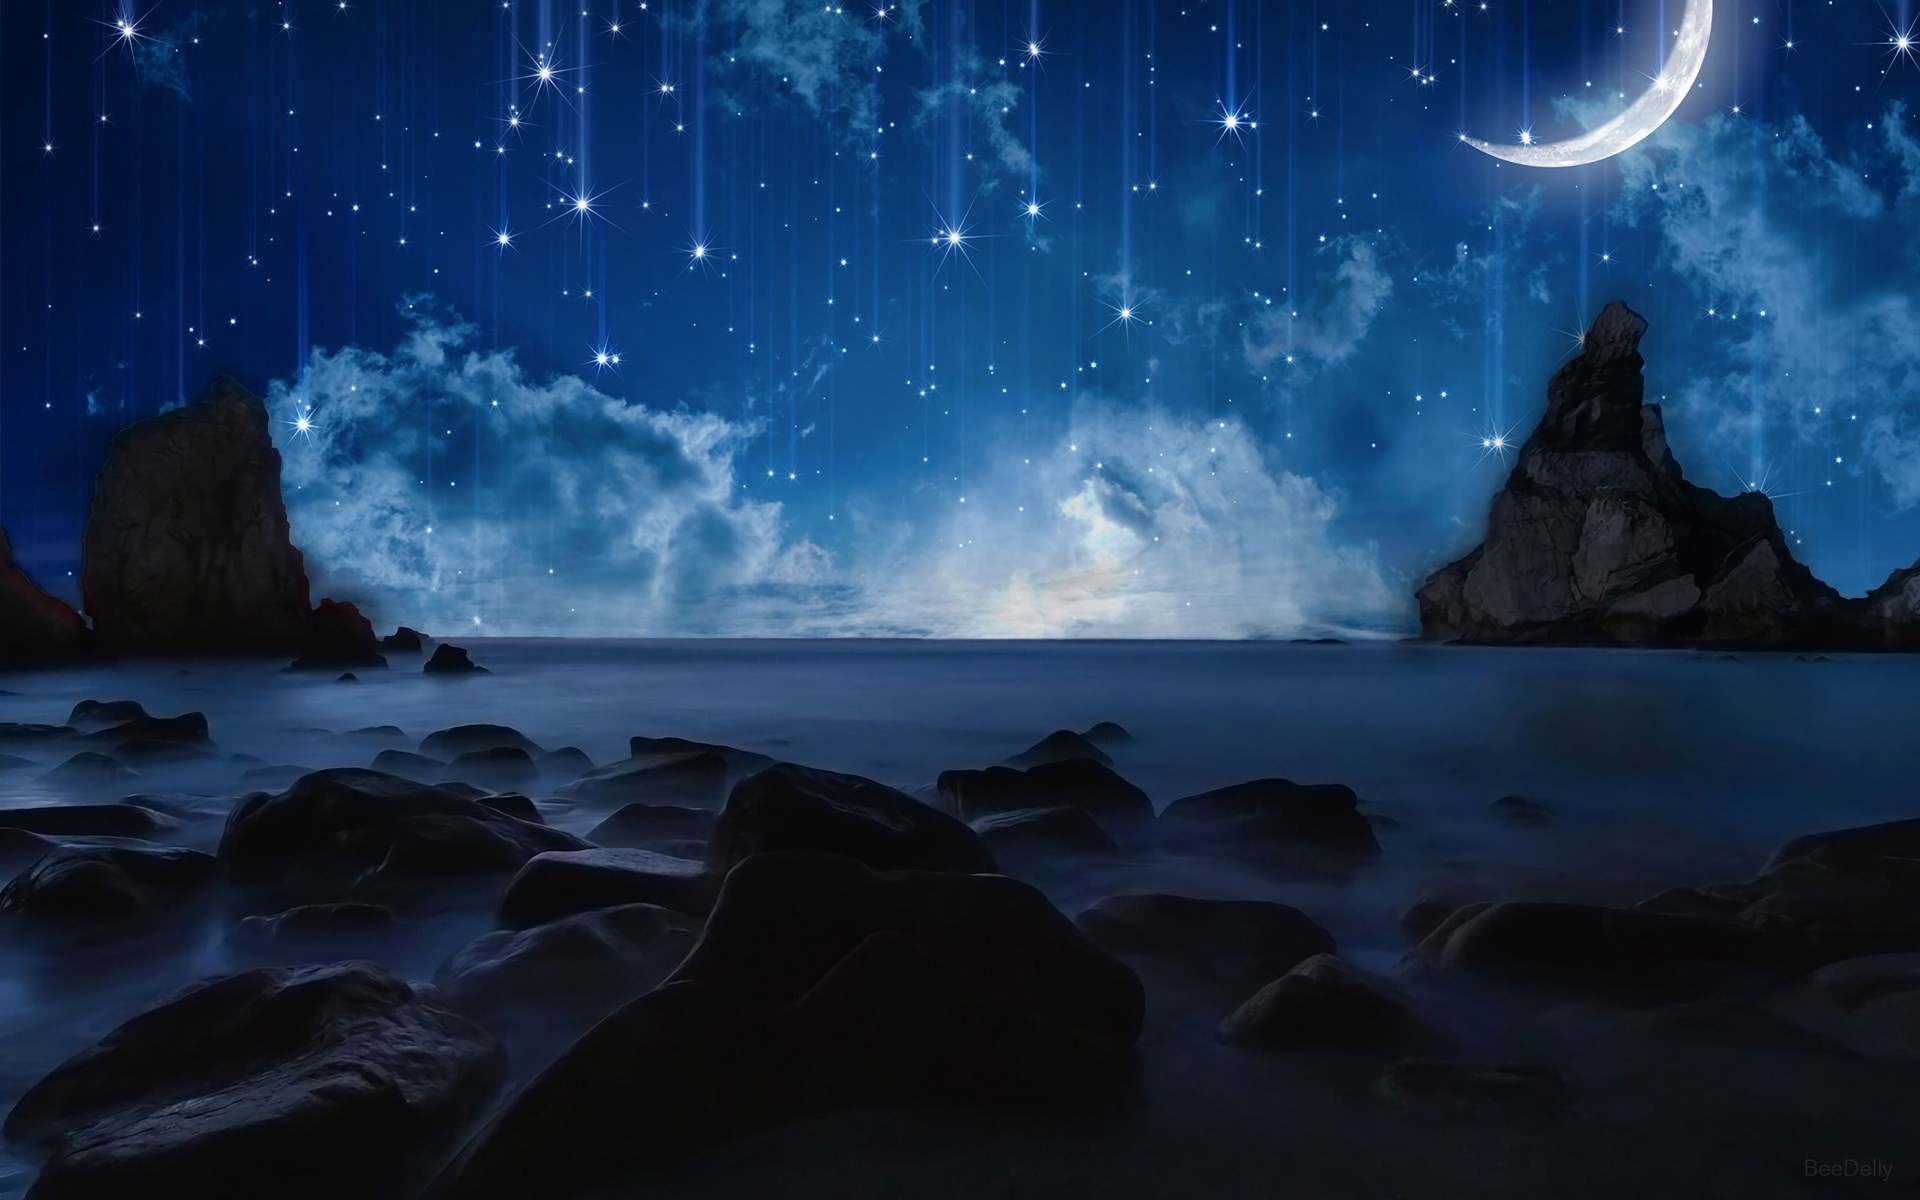 Fairy Desktop Wallpaper (63+ images)